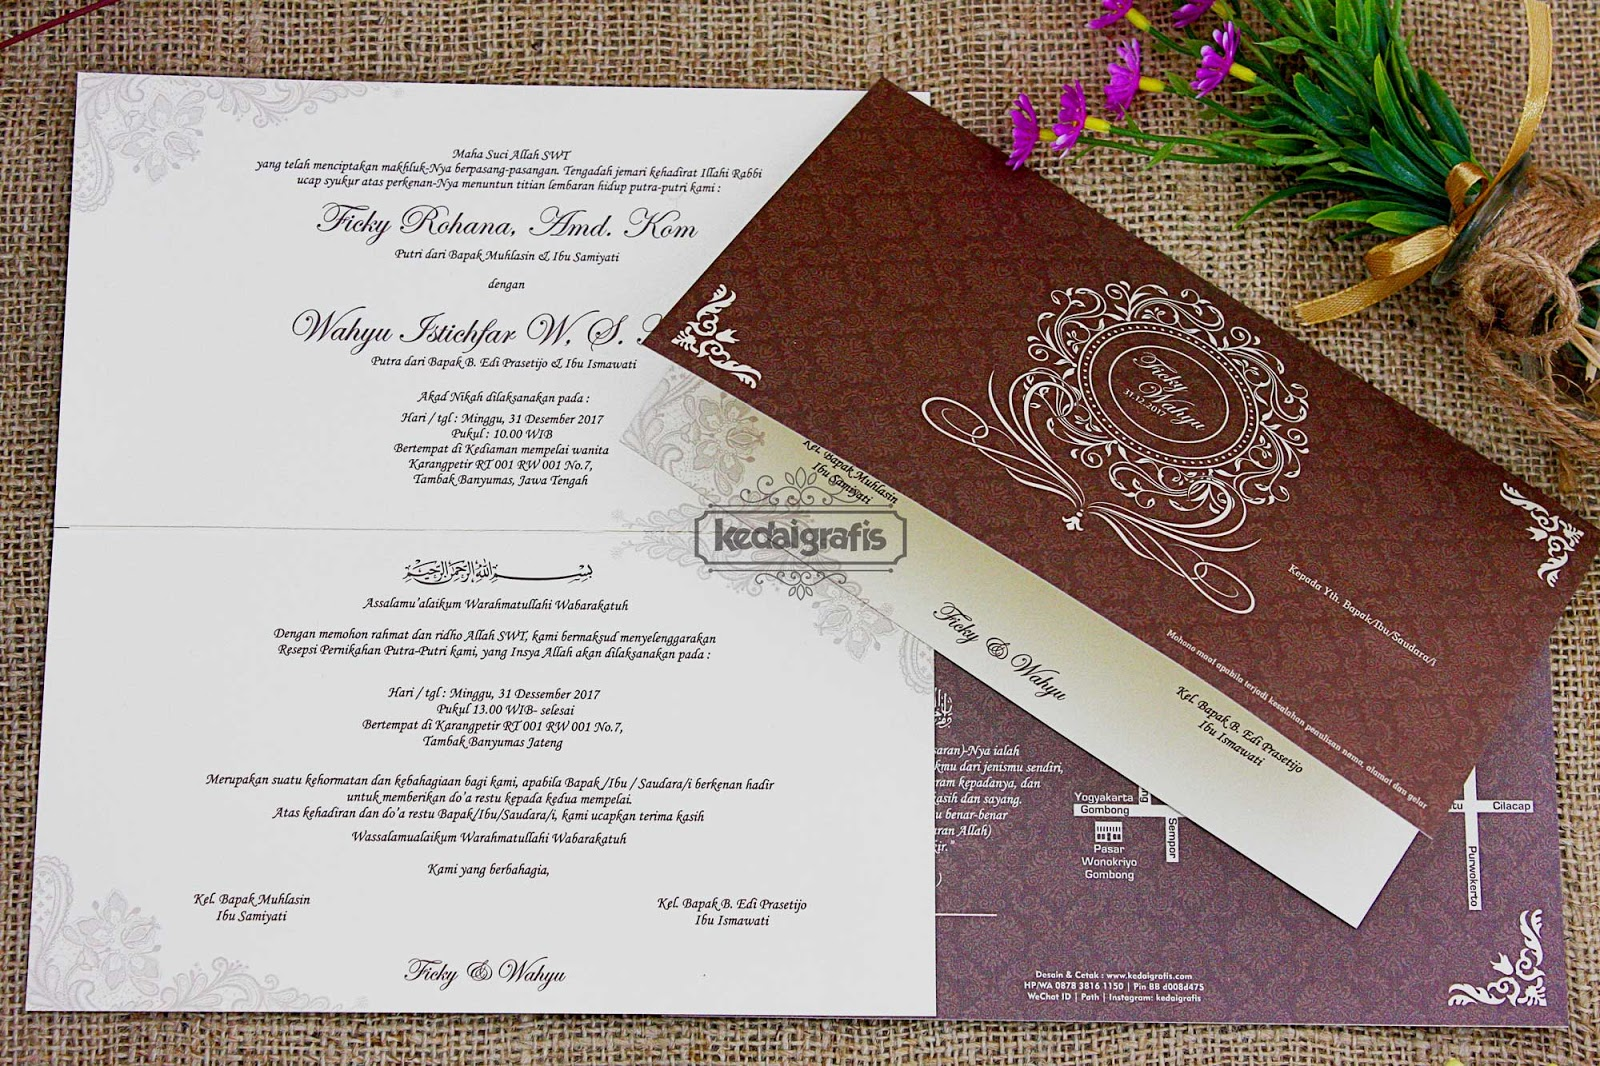 Contoh Undangan Pernikahan Yang Simple